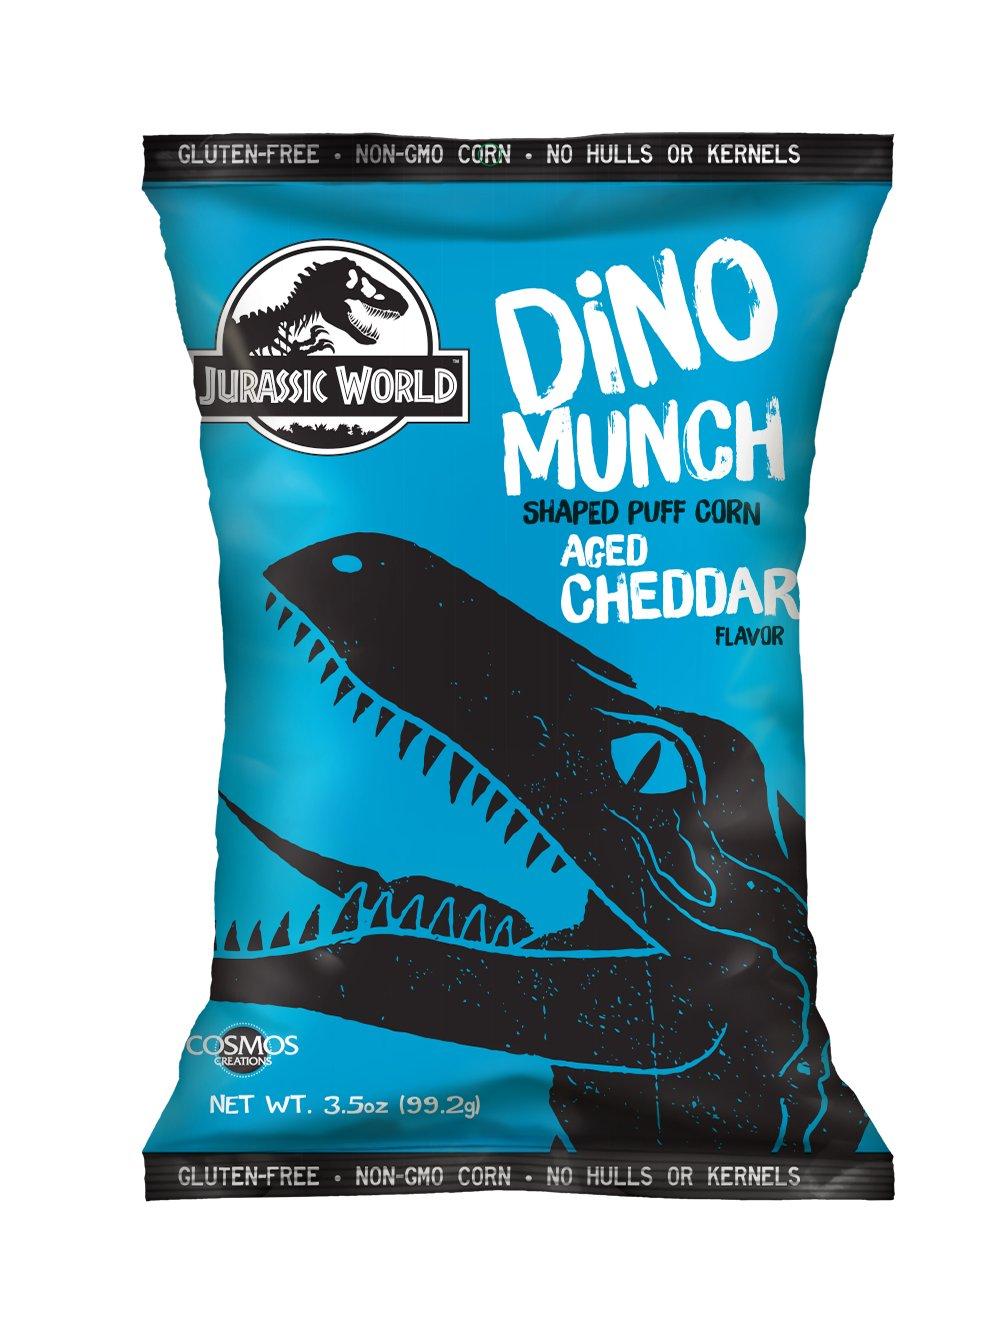 Jurassic World Dino Munch Aged Cheddar Dino Shaped Puff Corn 3.5 oz, Case of 8